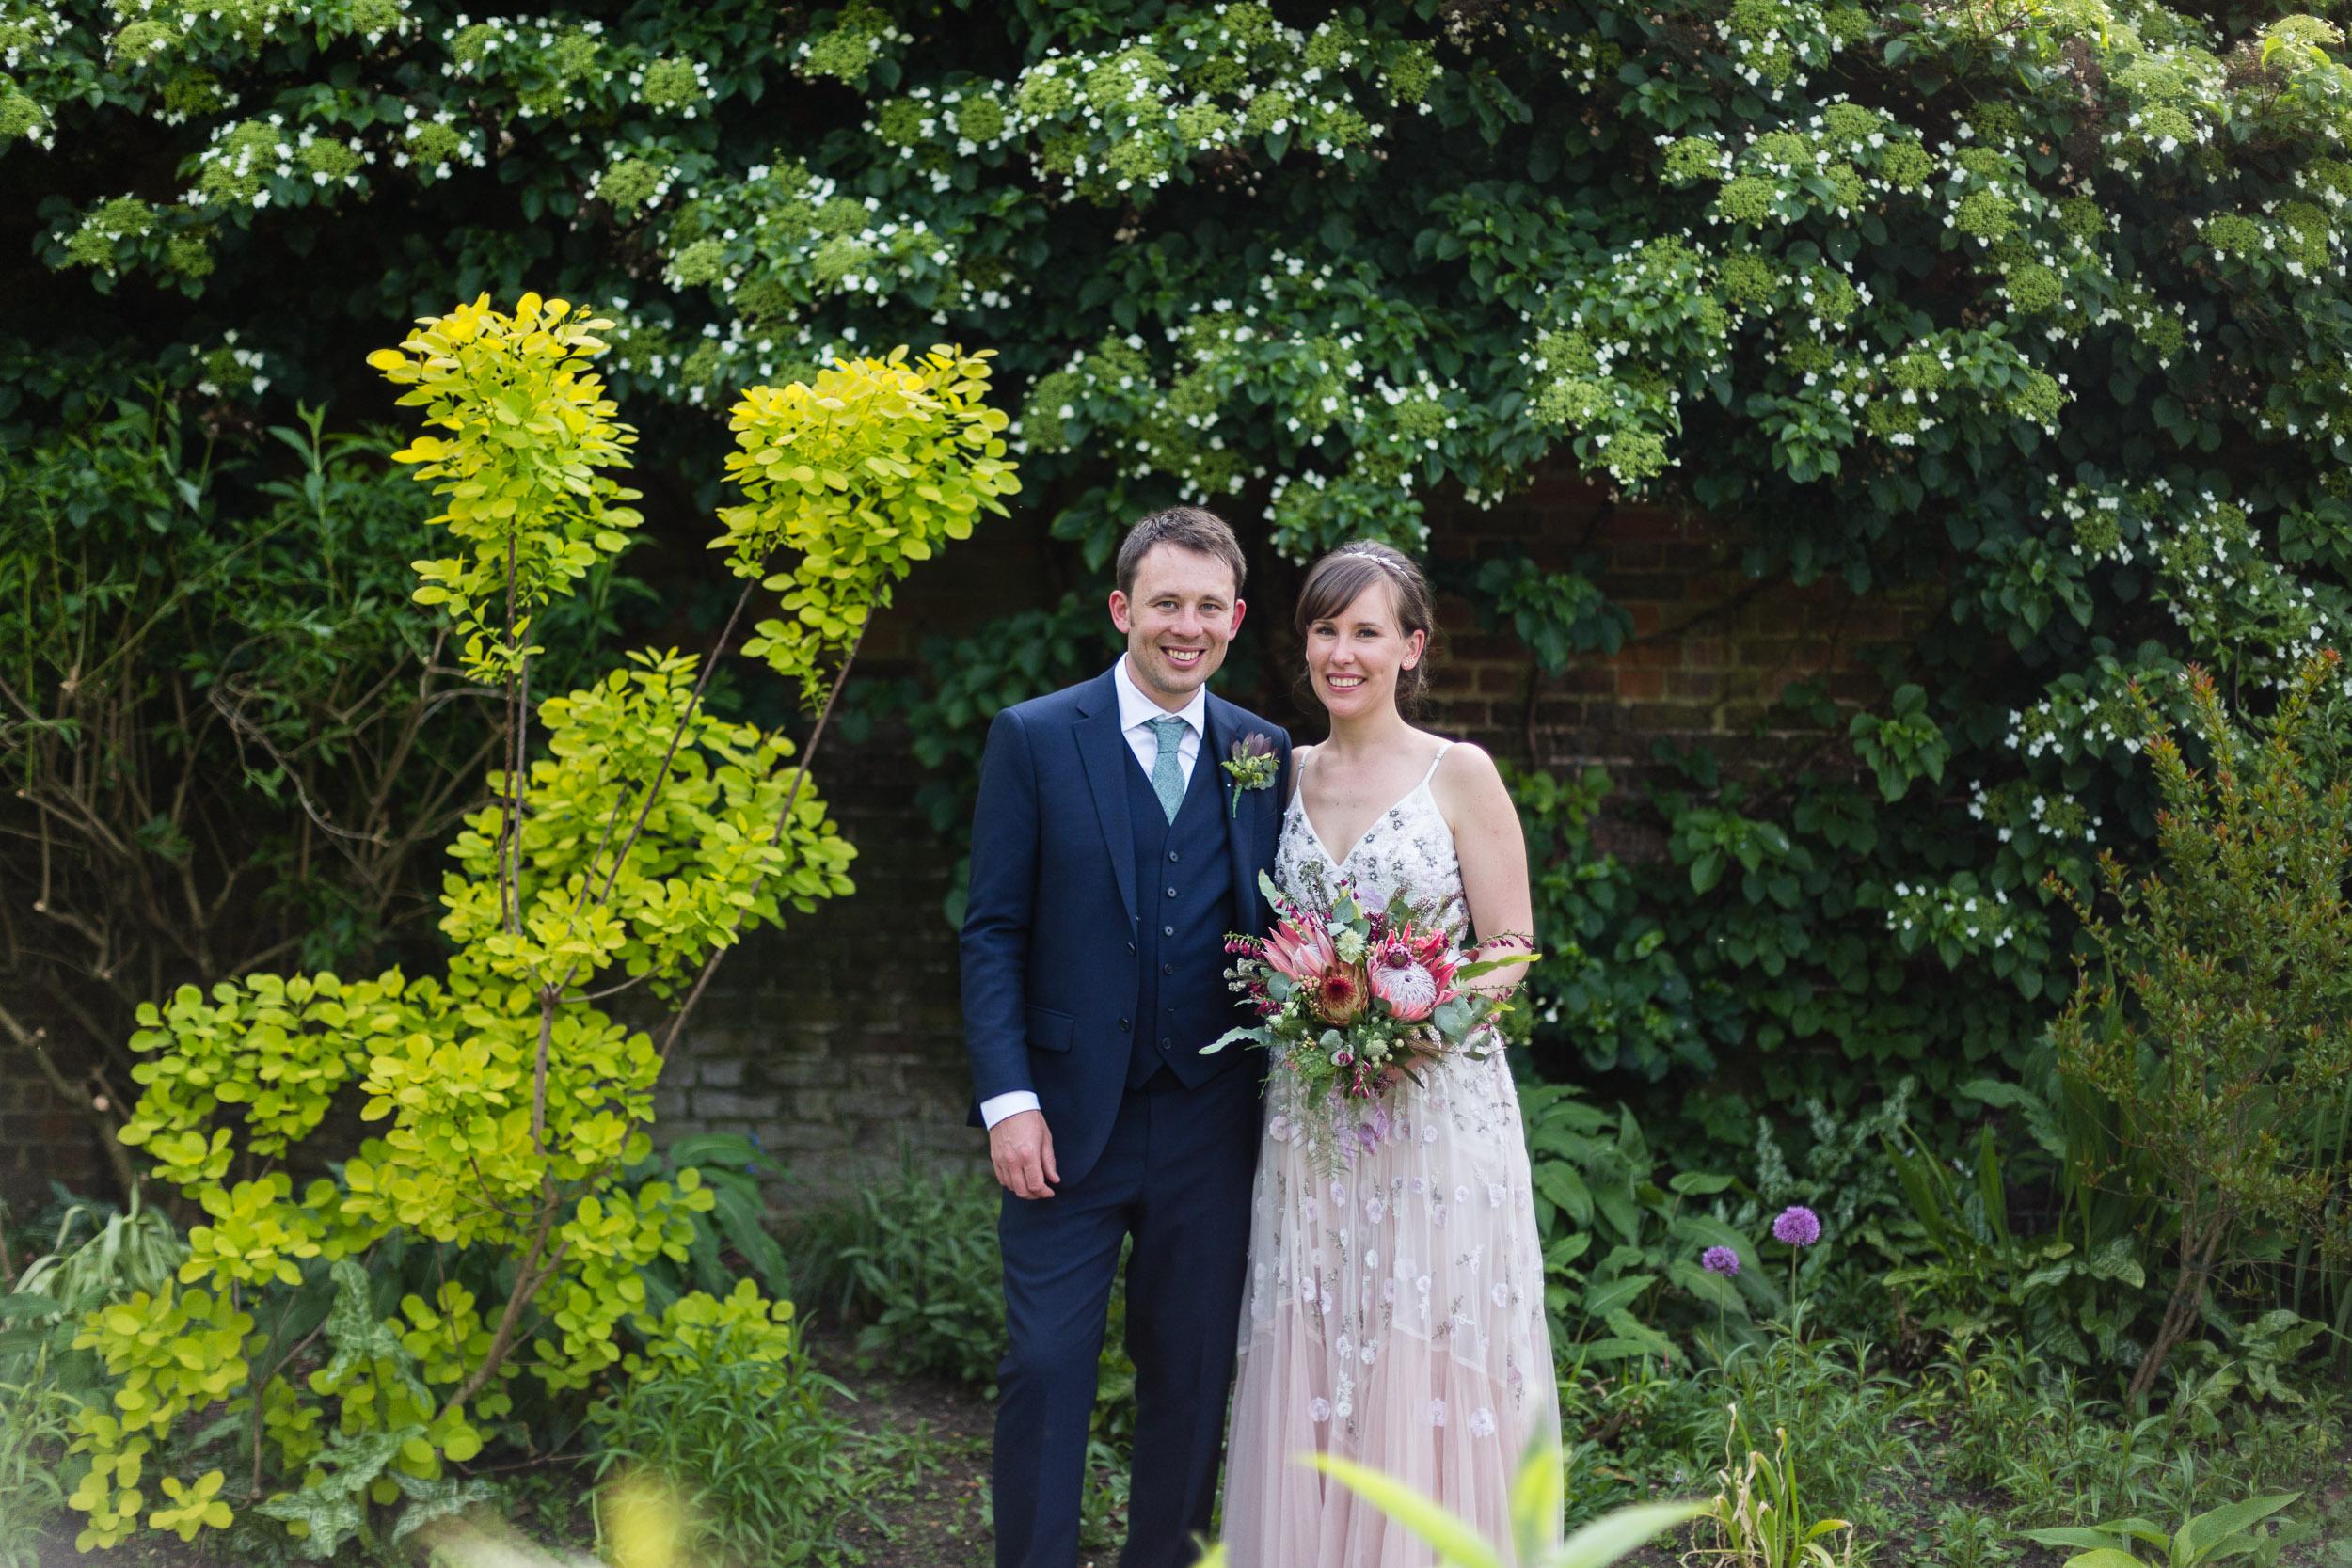 brockwell-lido-brixton-herne-hill-wedding-281.jpg